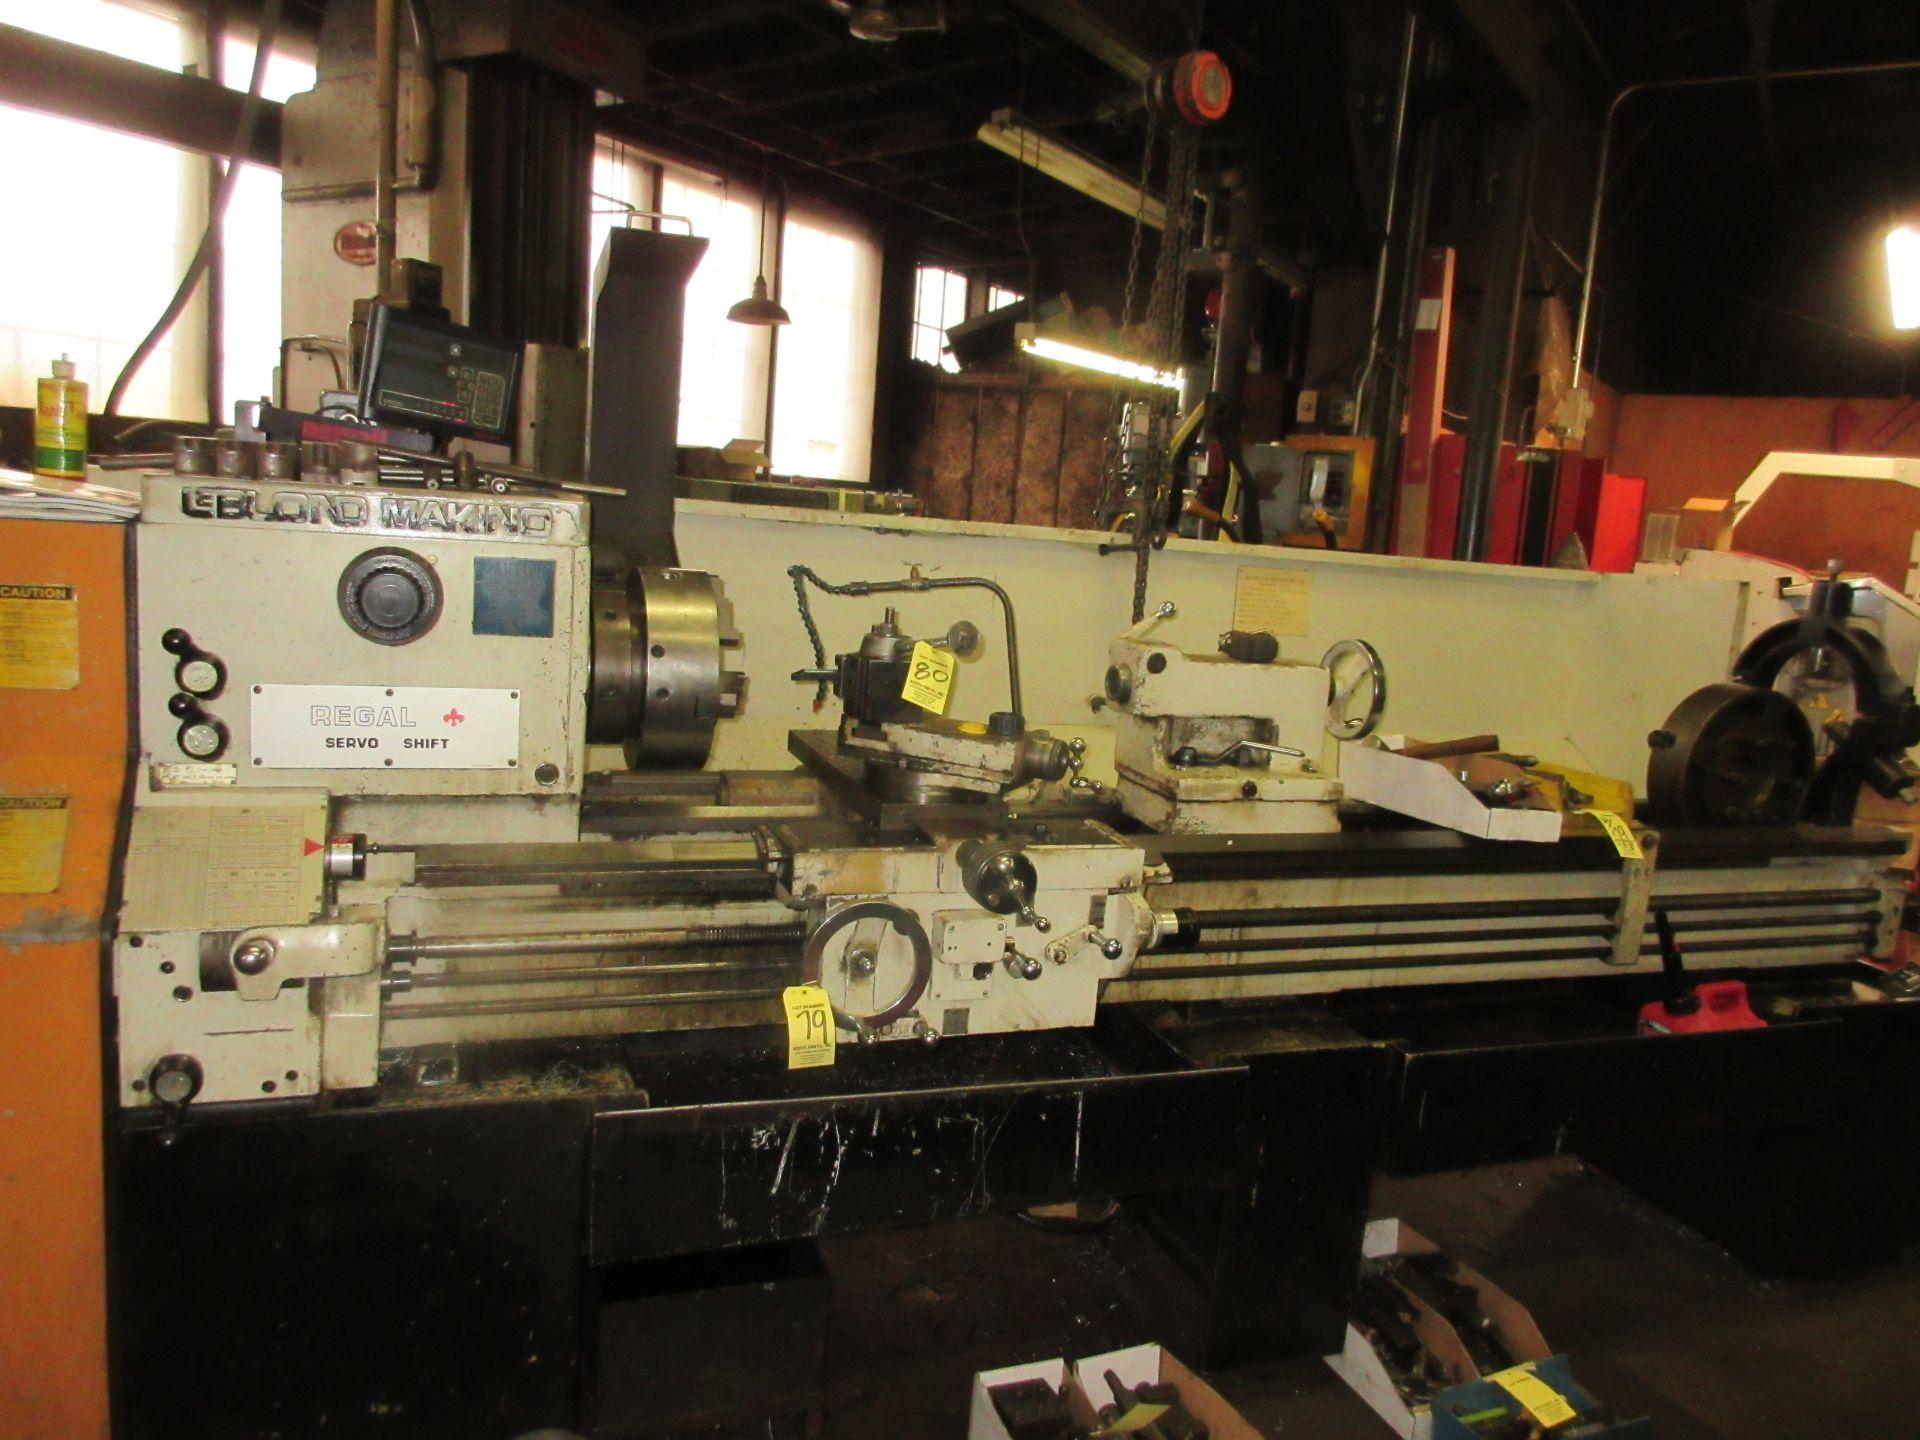 "(1) Leblond Makino Regal Servo Shift Toolroom Lathe S/N 15E-325 72"" Long W/3"" Spindle Hole (1)"